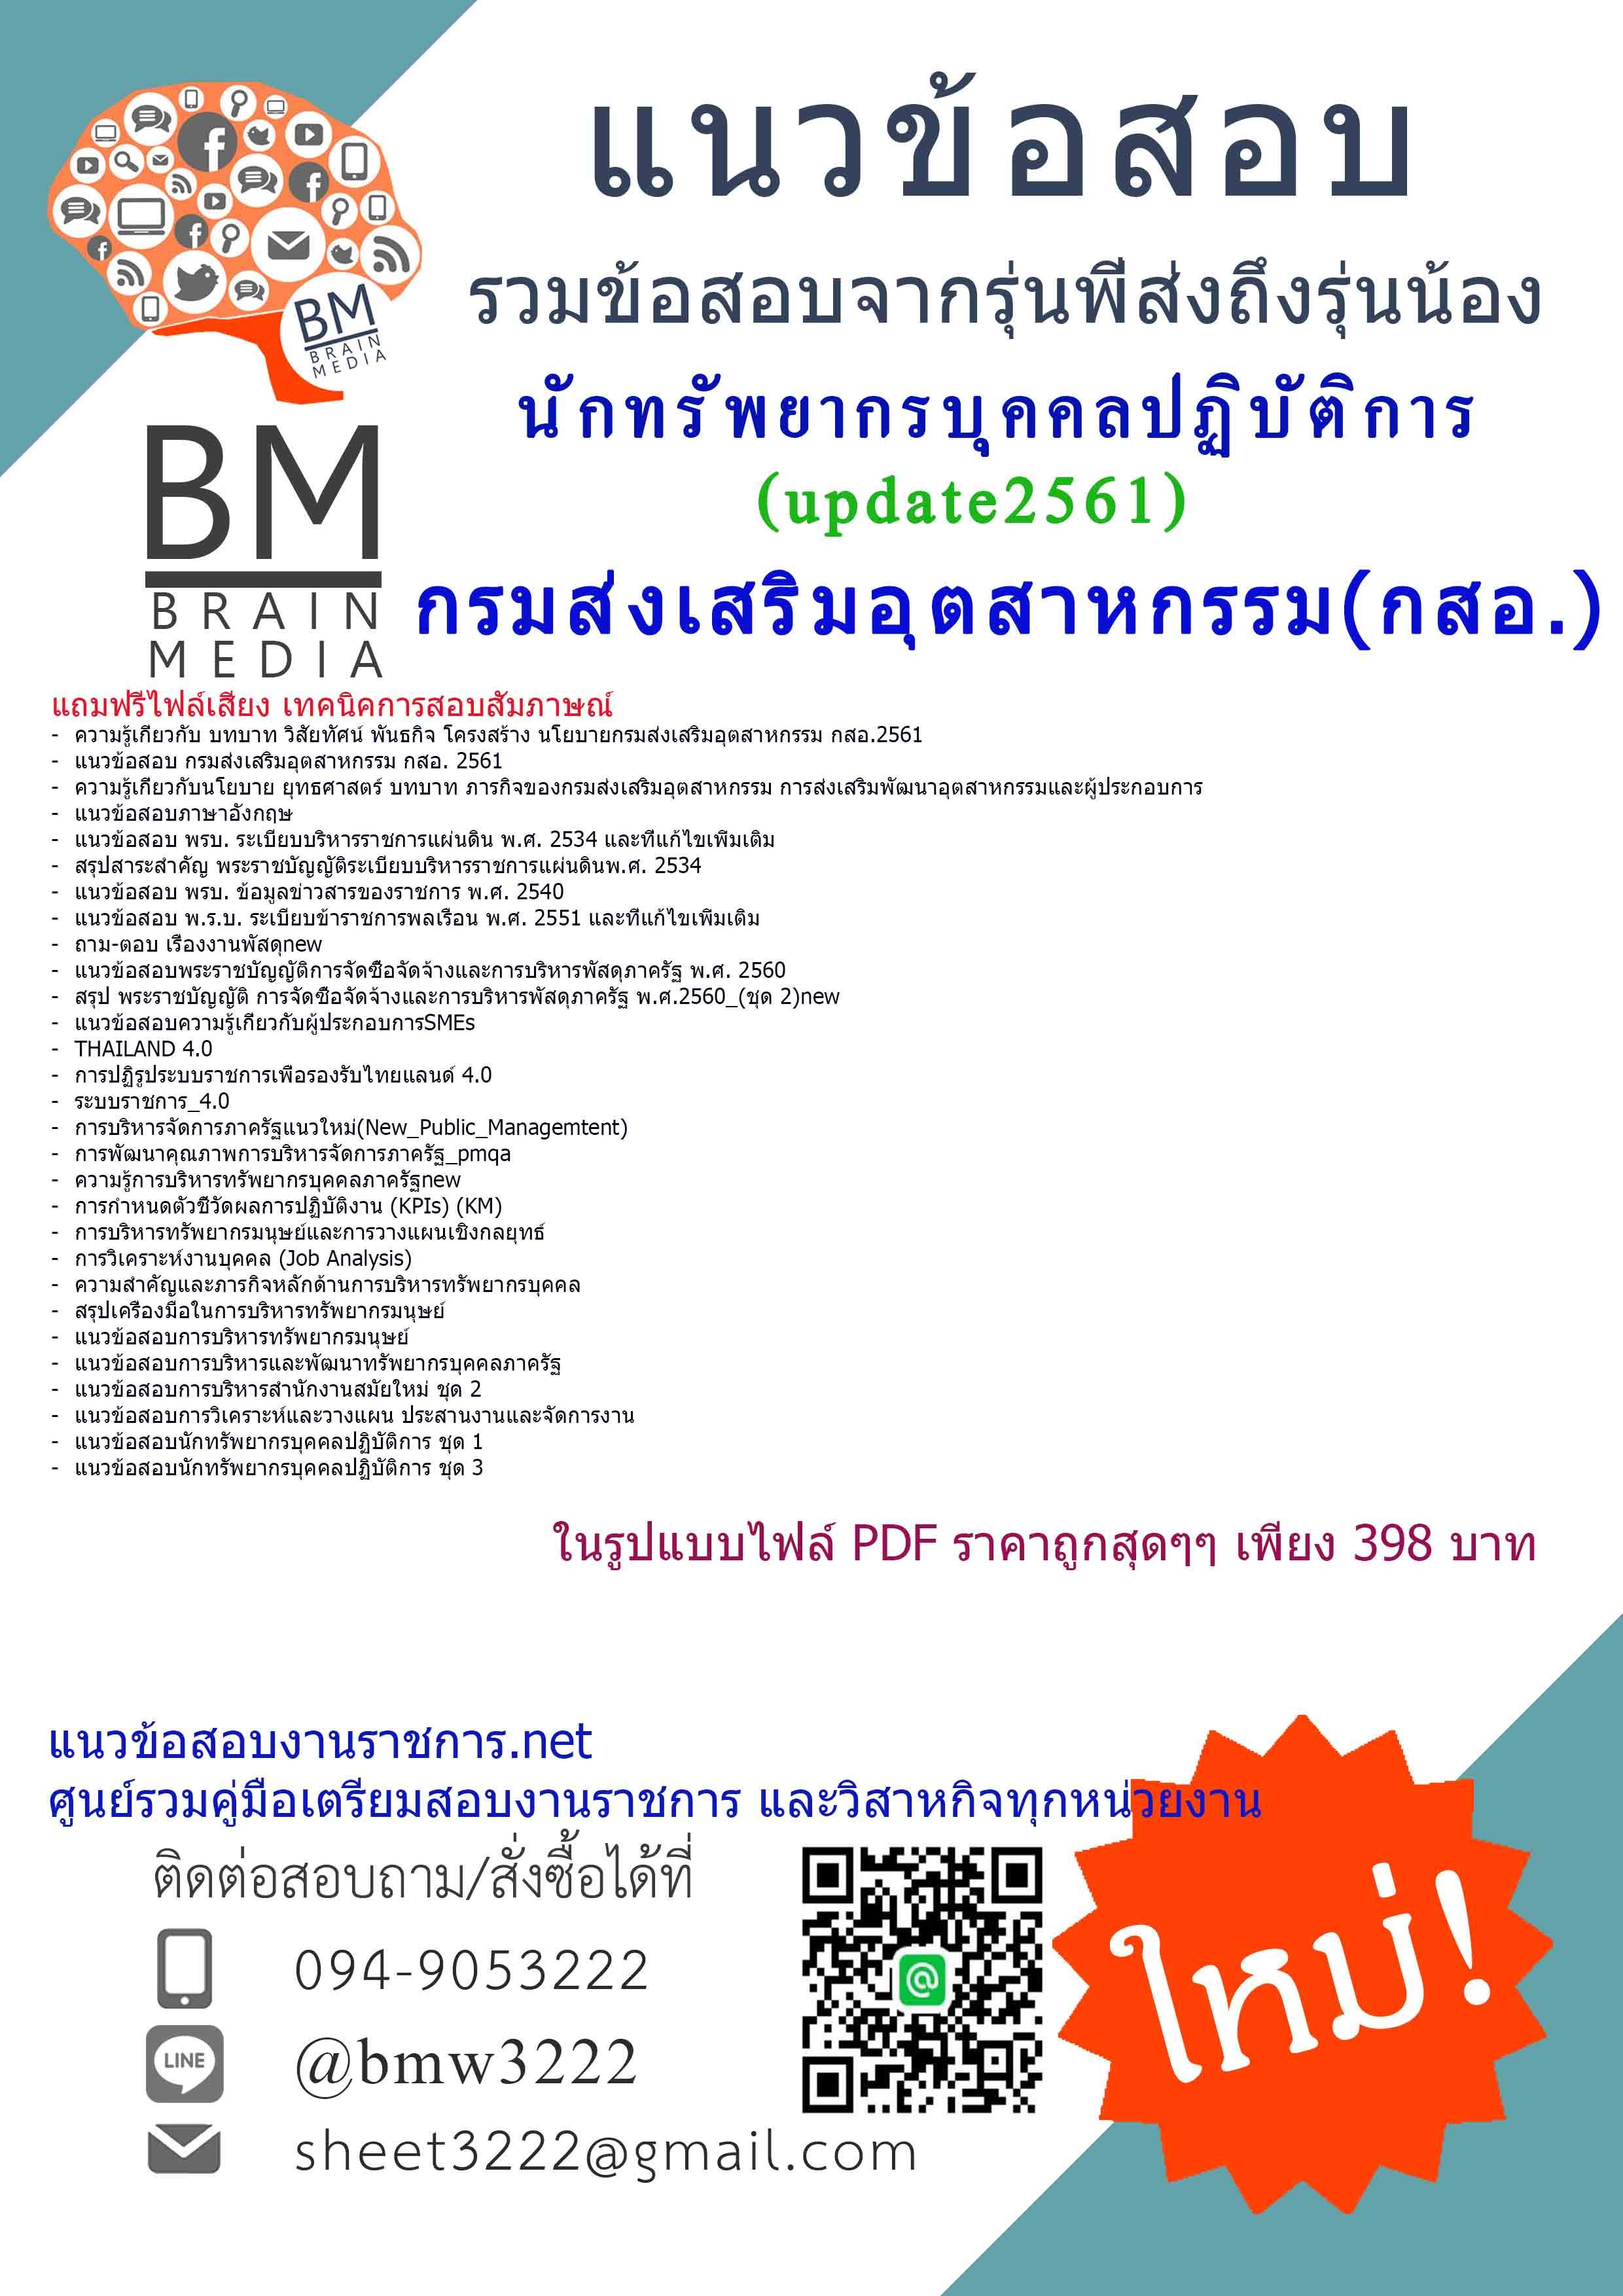 (((updateที่สุด))) แนวข้อสอบนักทรัพยากรบุคคลปฏิบัติการกรมส่งเสริมอุตสาหกรรม(กสอ.)2561